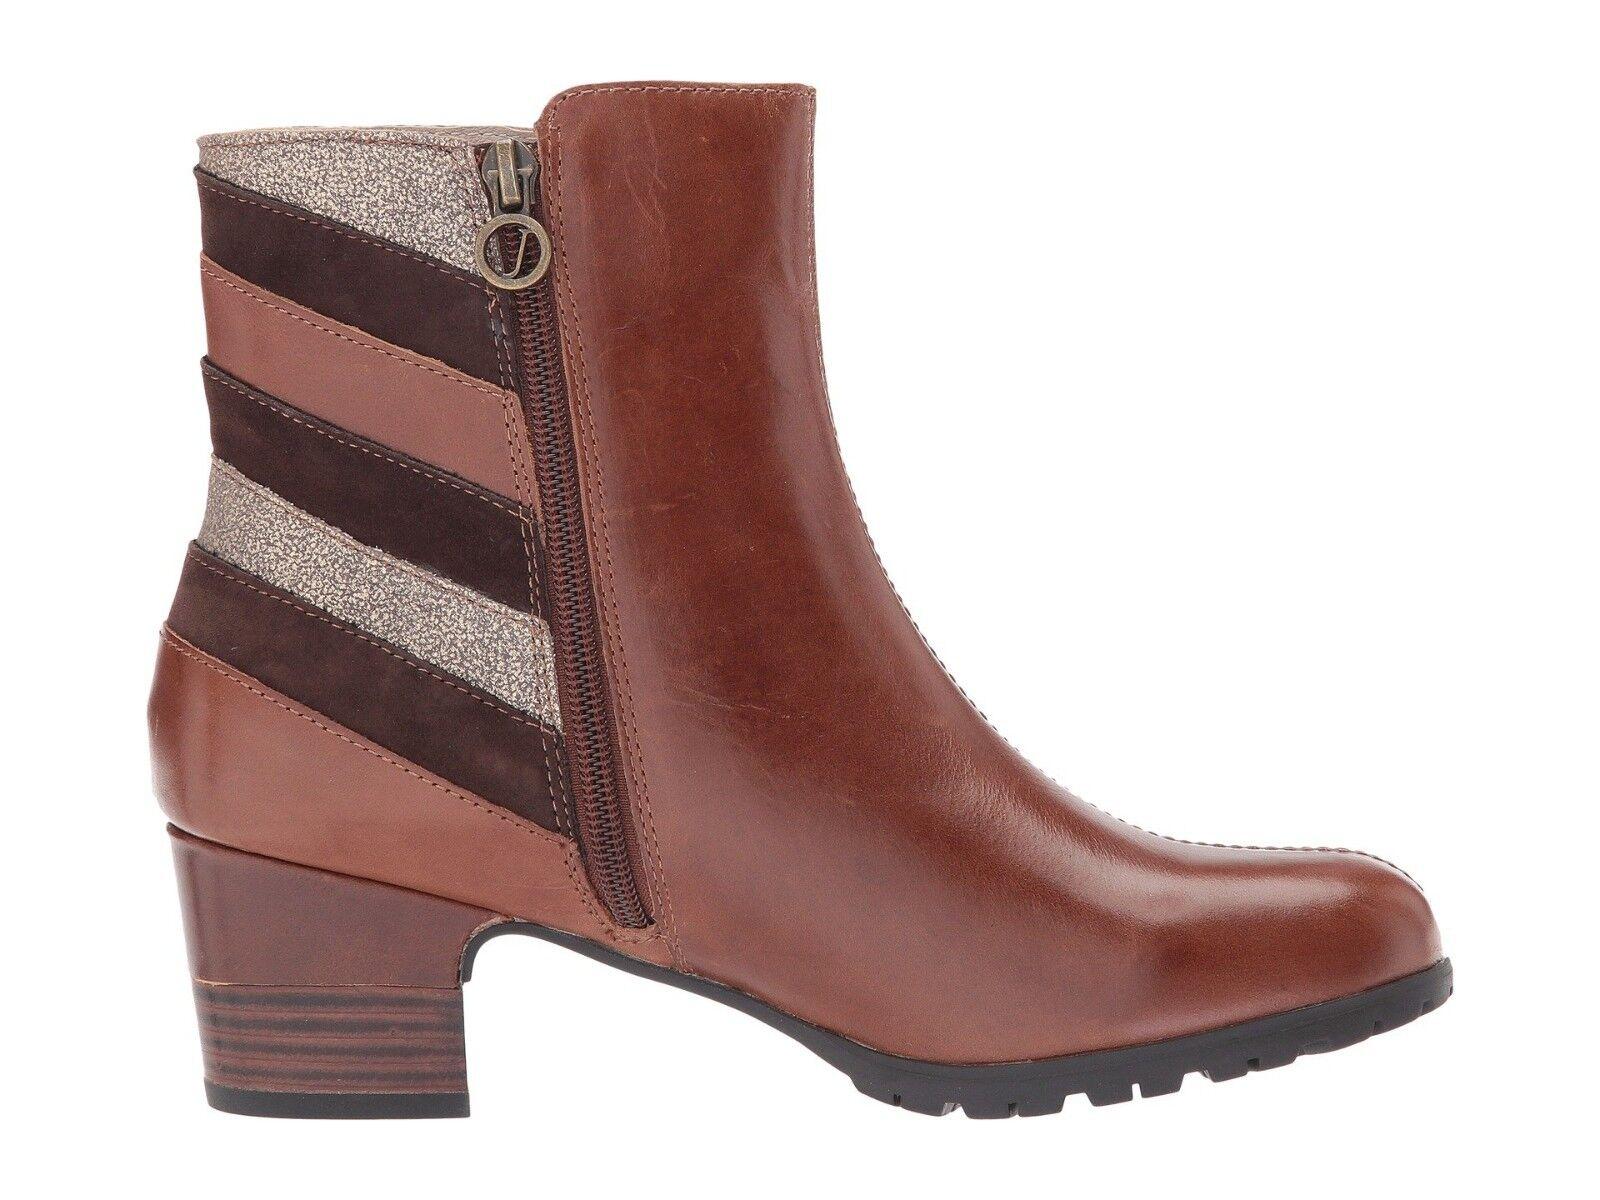 Jambu Amal Water Resistant Block Heel Booties Ankle Boots Brown Stripe Size 10 M